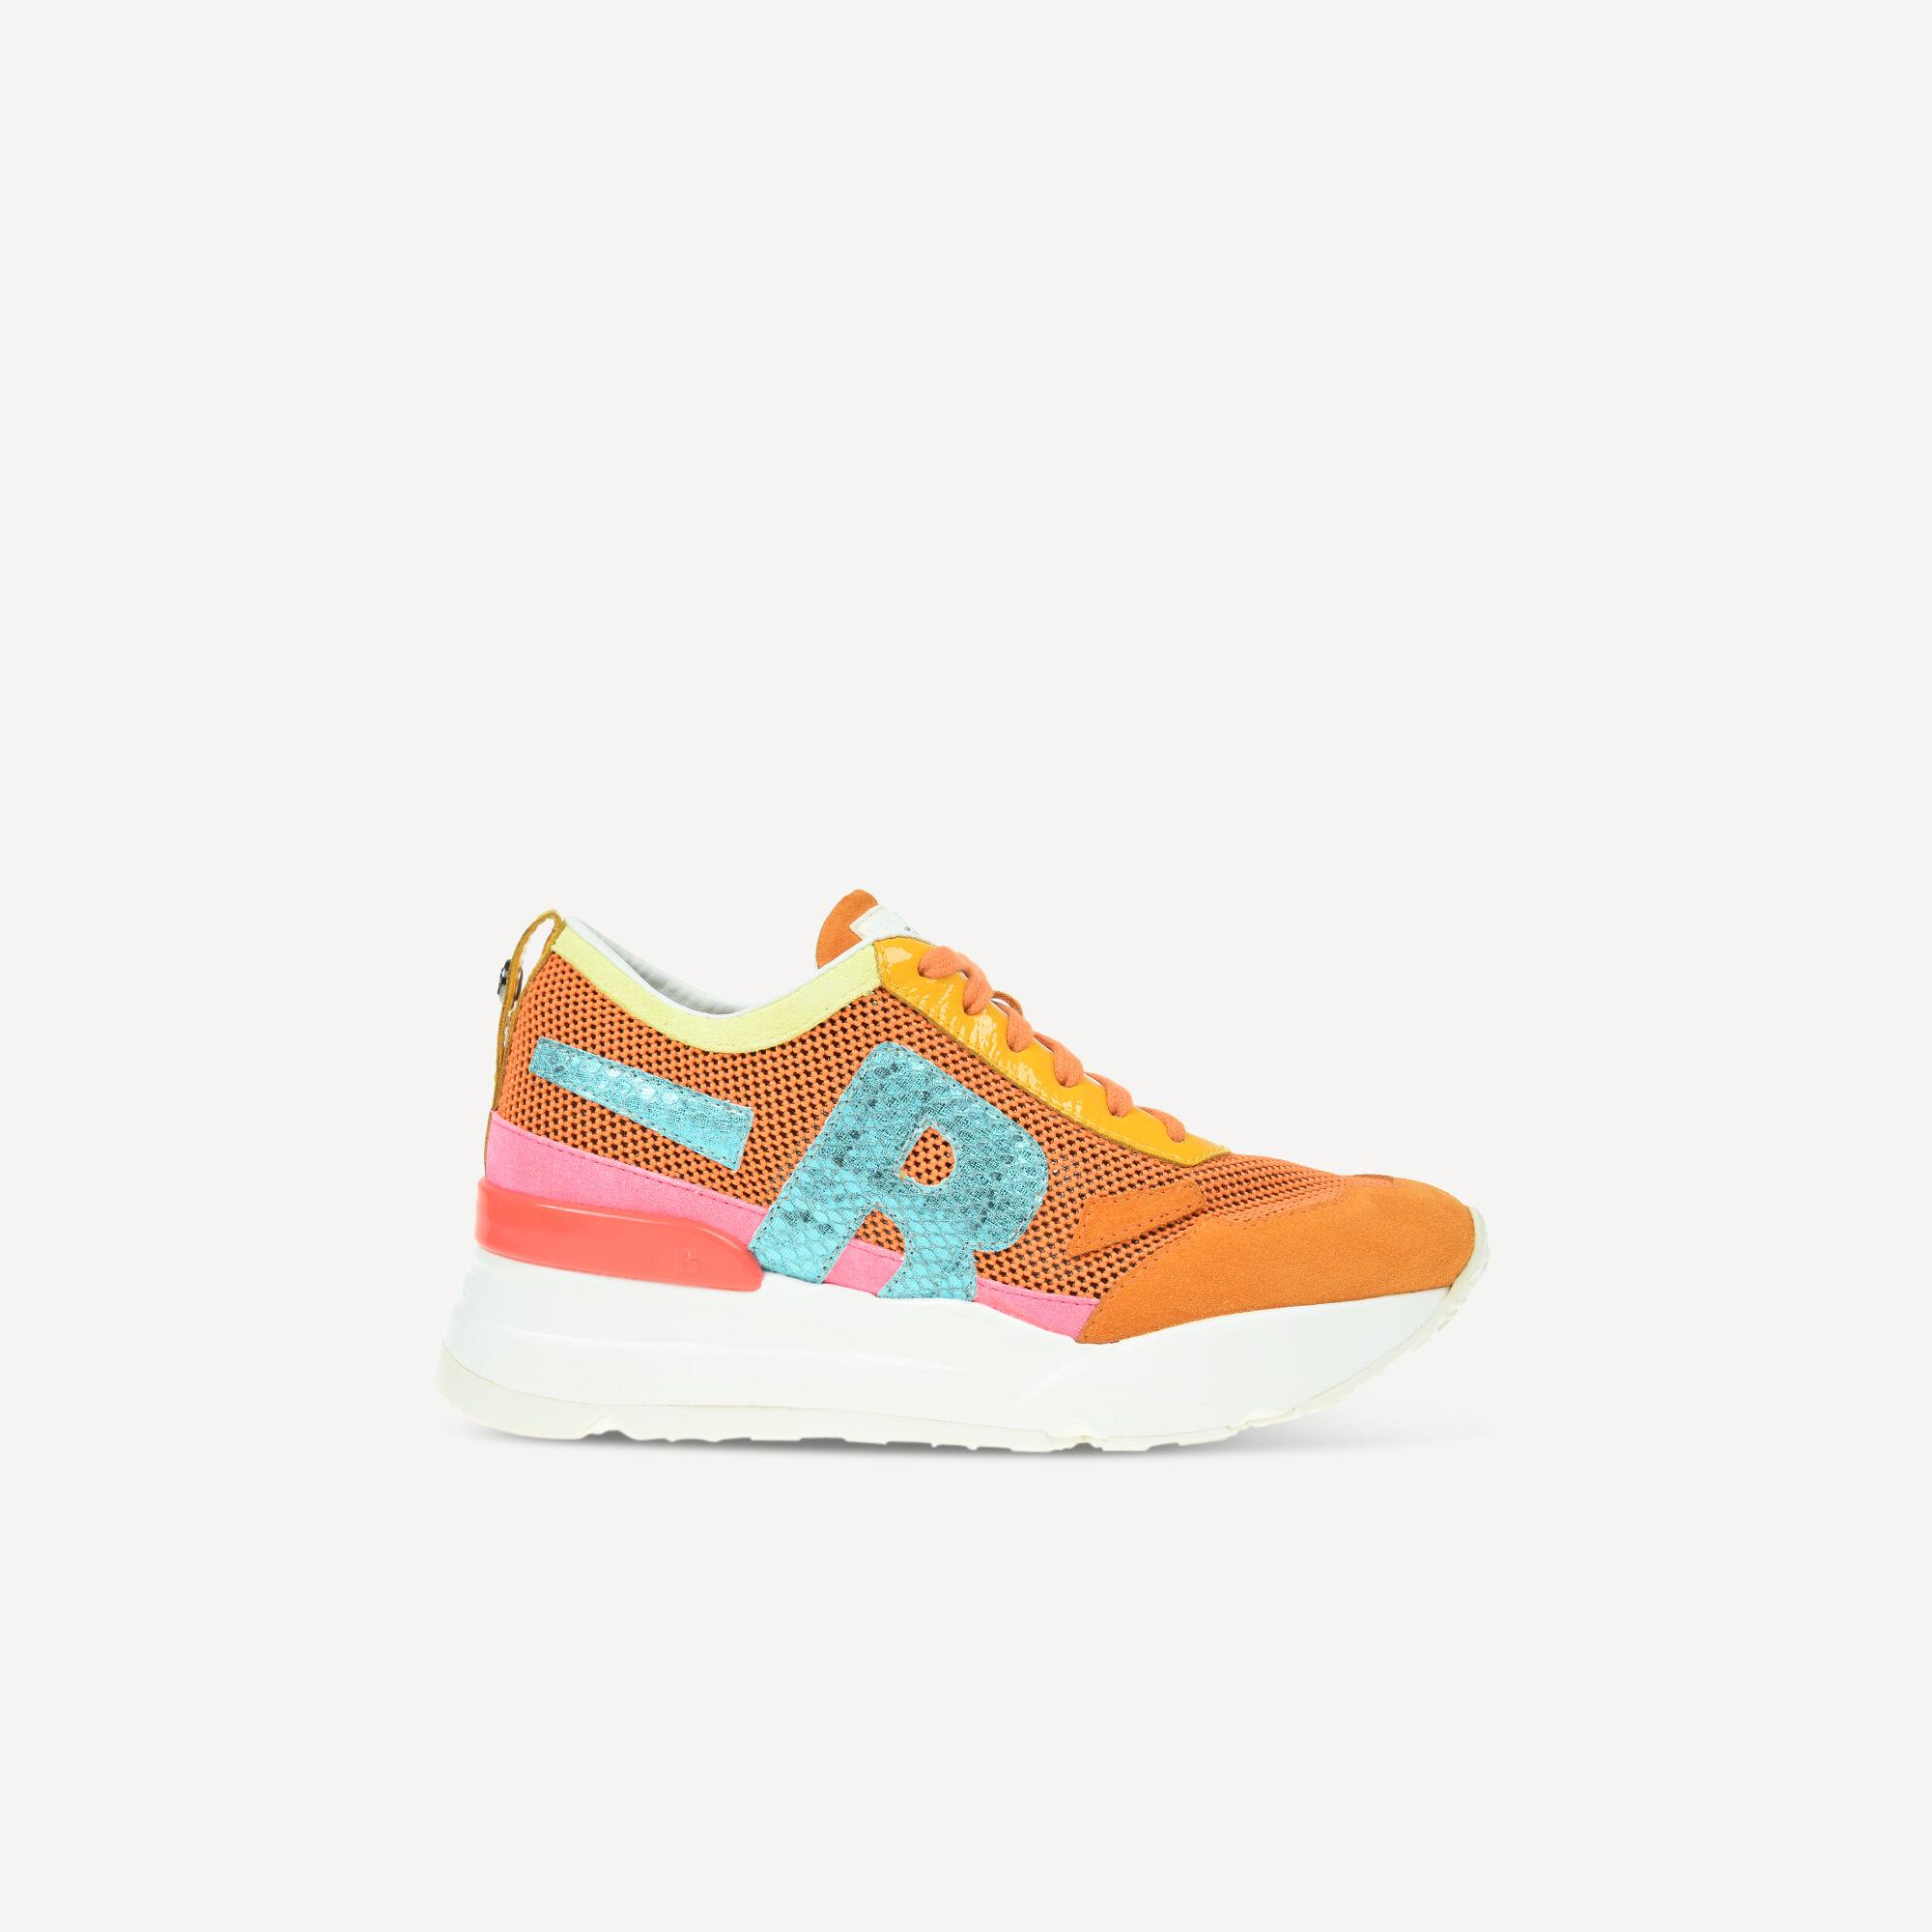 sneakers for cheap 8fee8 64674 ... where to buy ua scorpio maschiota verde scarpe on vendita r evolve  running 4009 multy scorpion